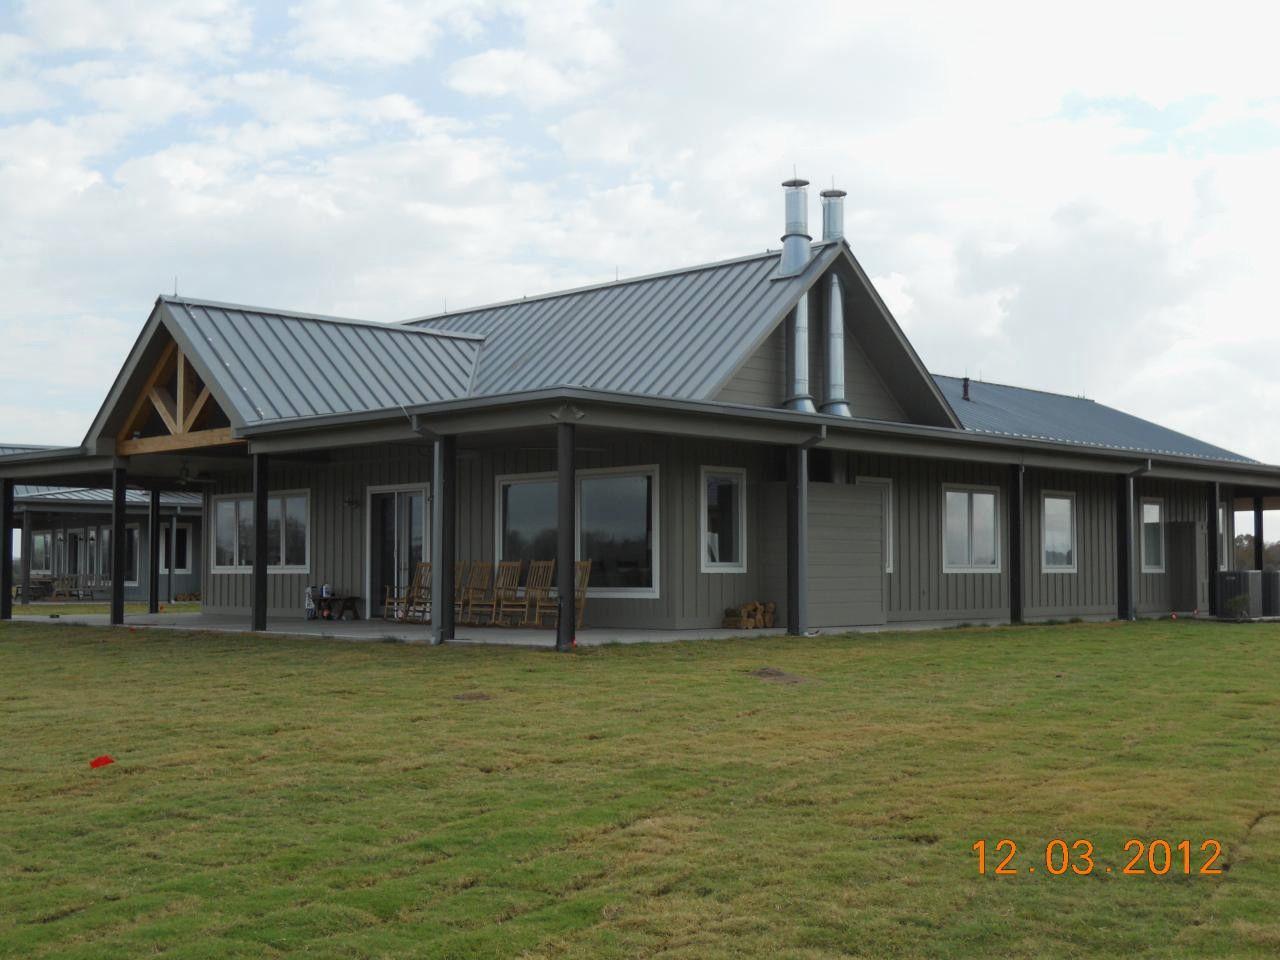 Wrap around porch house plans in barndominium floor also roof line rh pinterest